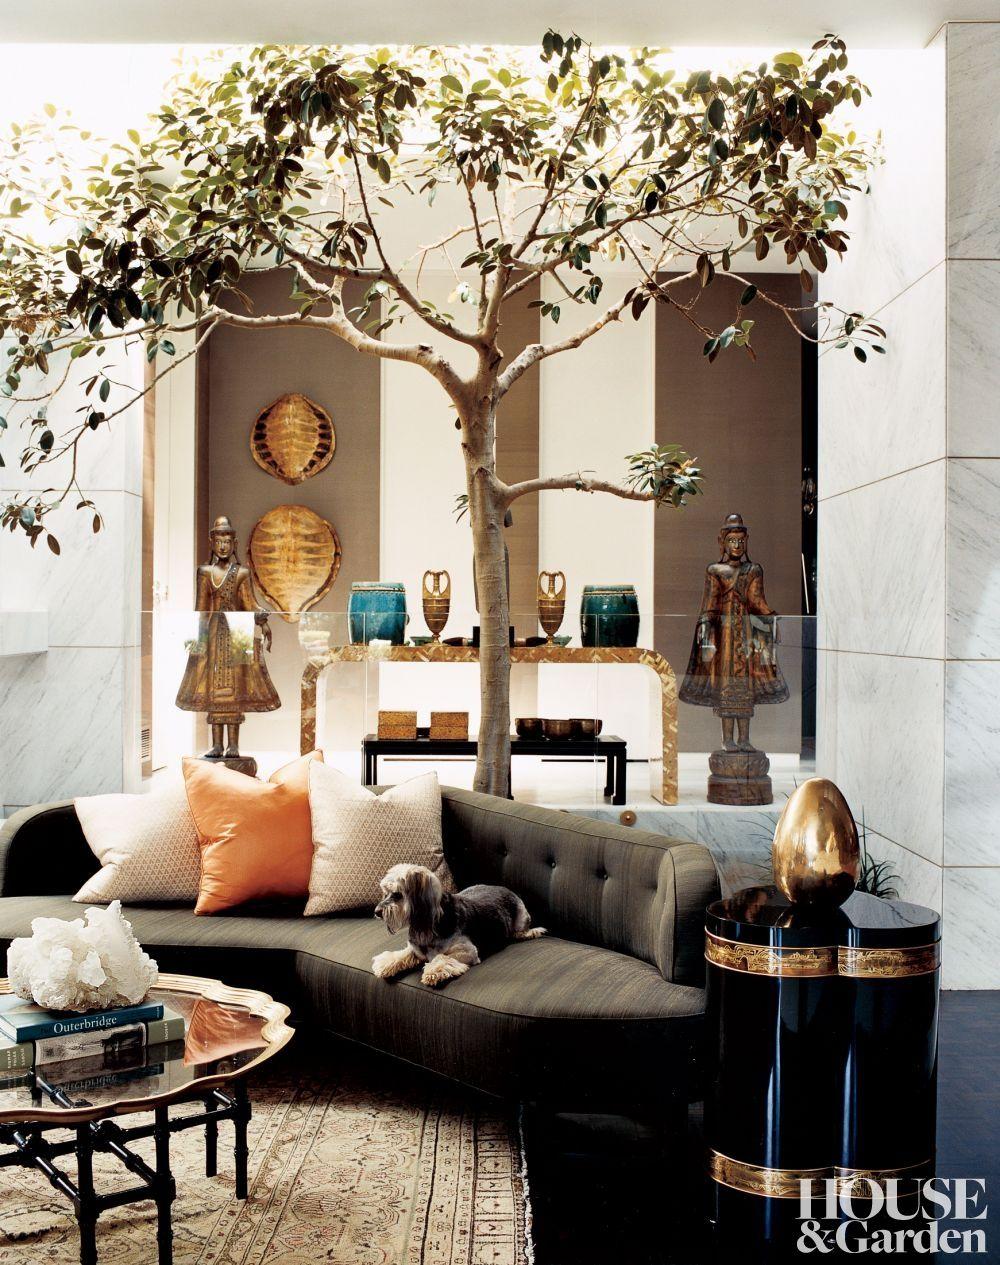 2 Top Designers Decorate One Amazing Home Kelly Wearstler Indoor Tree Calcite Tortoise Shells